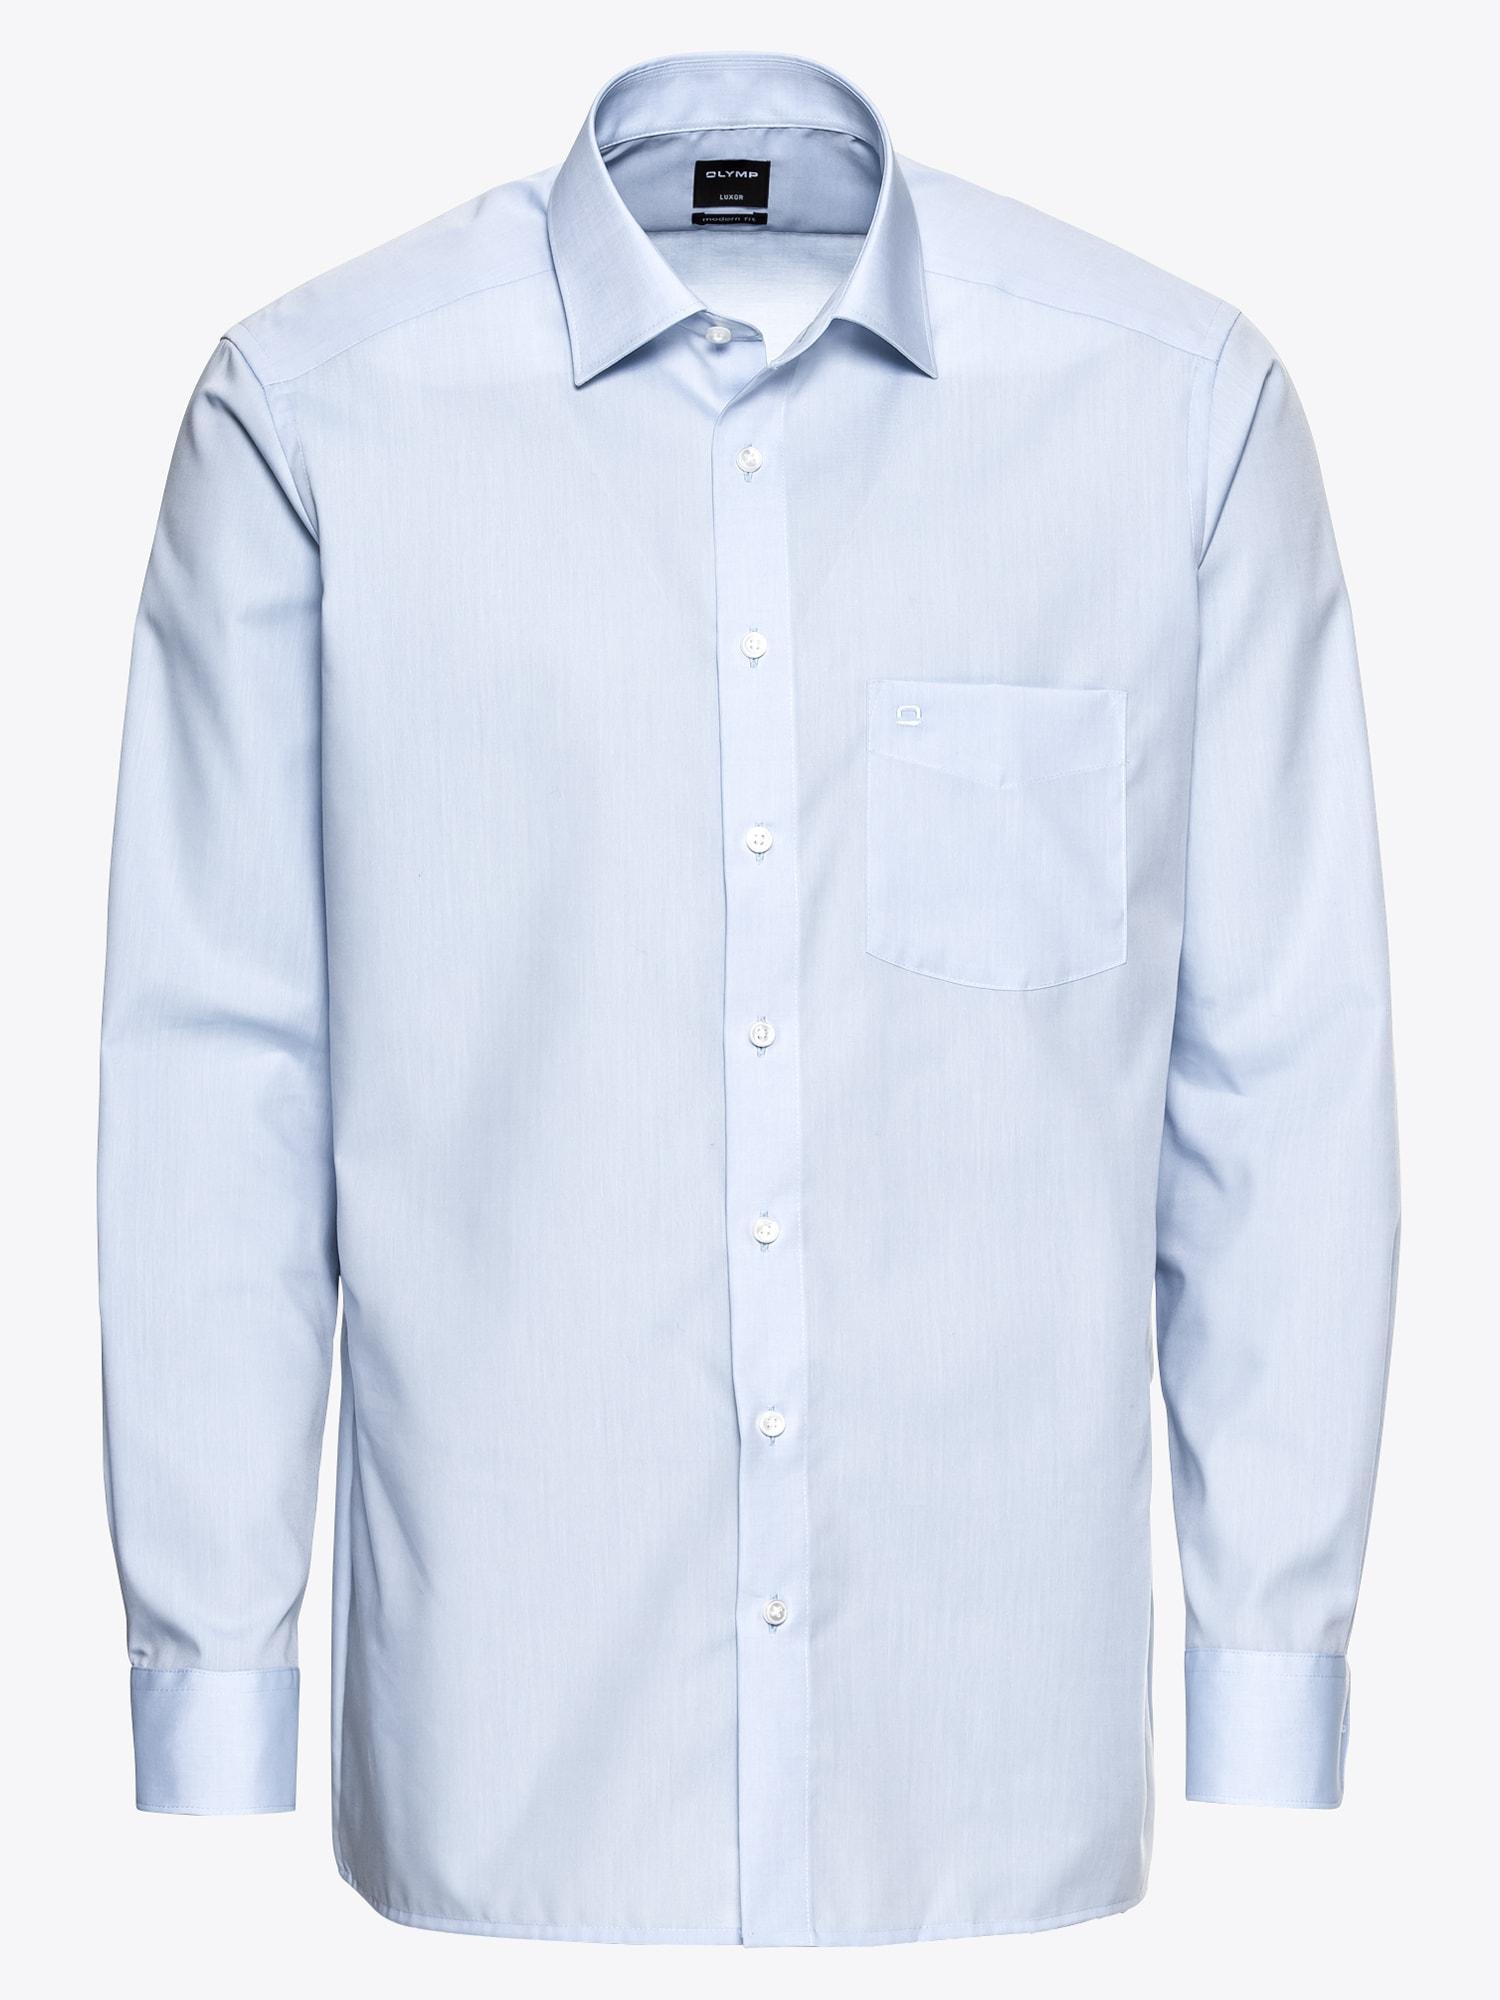 OLYMP, Heren Zakelijk overhemd 'Luxor Chambray', blauw